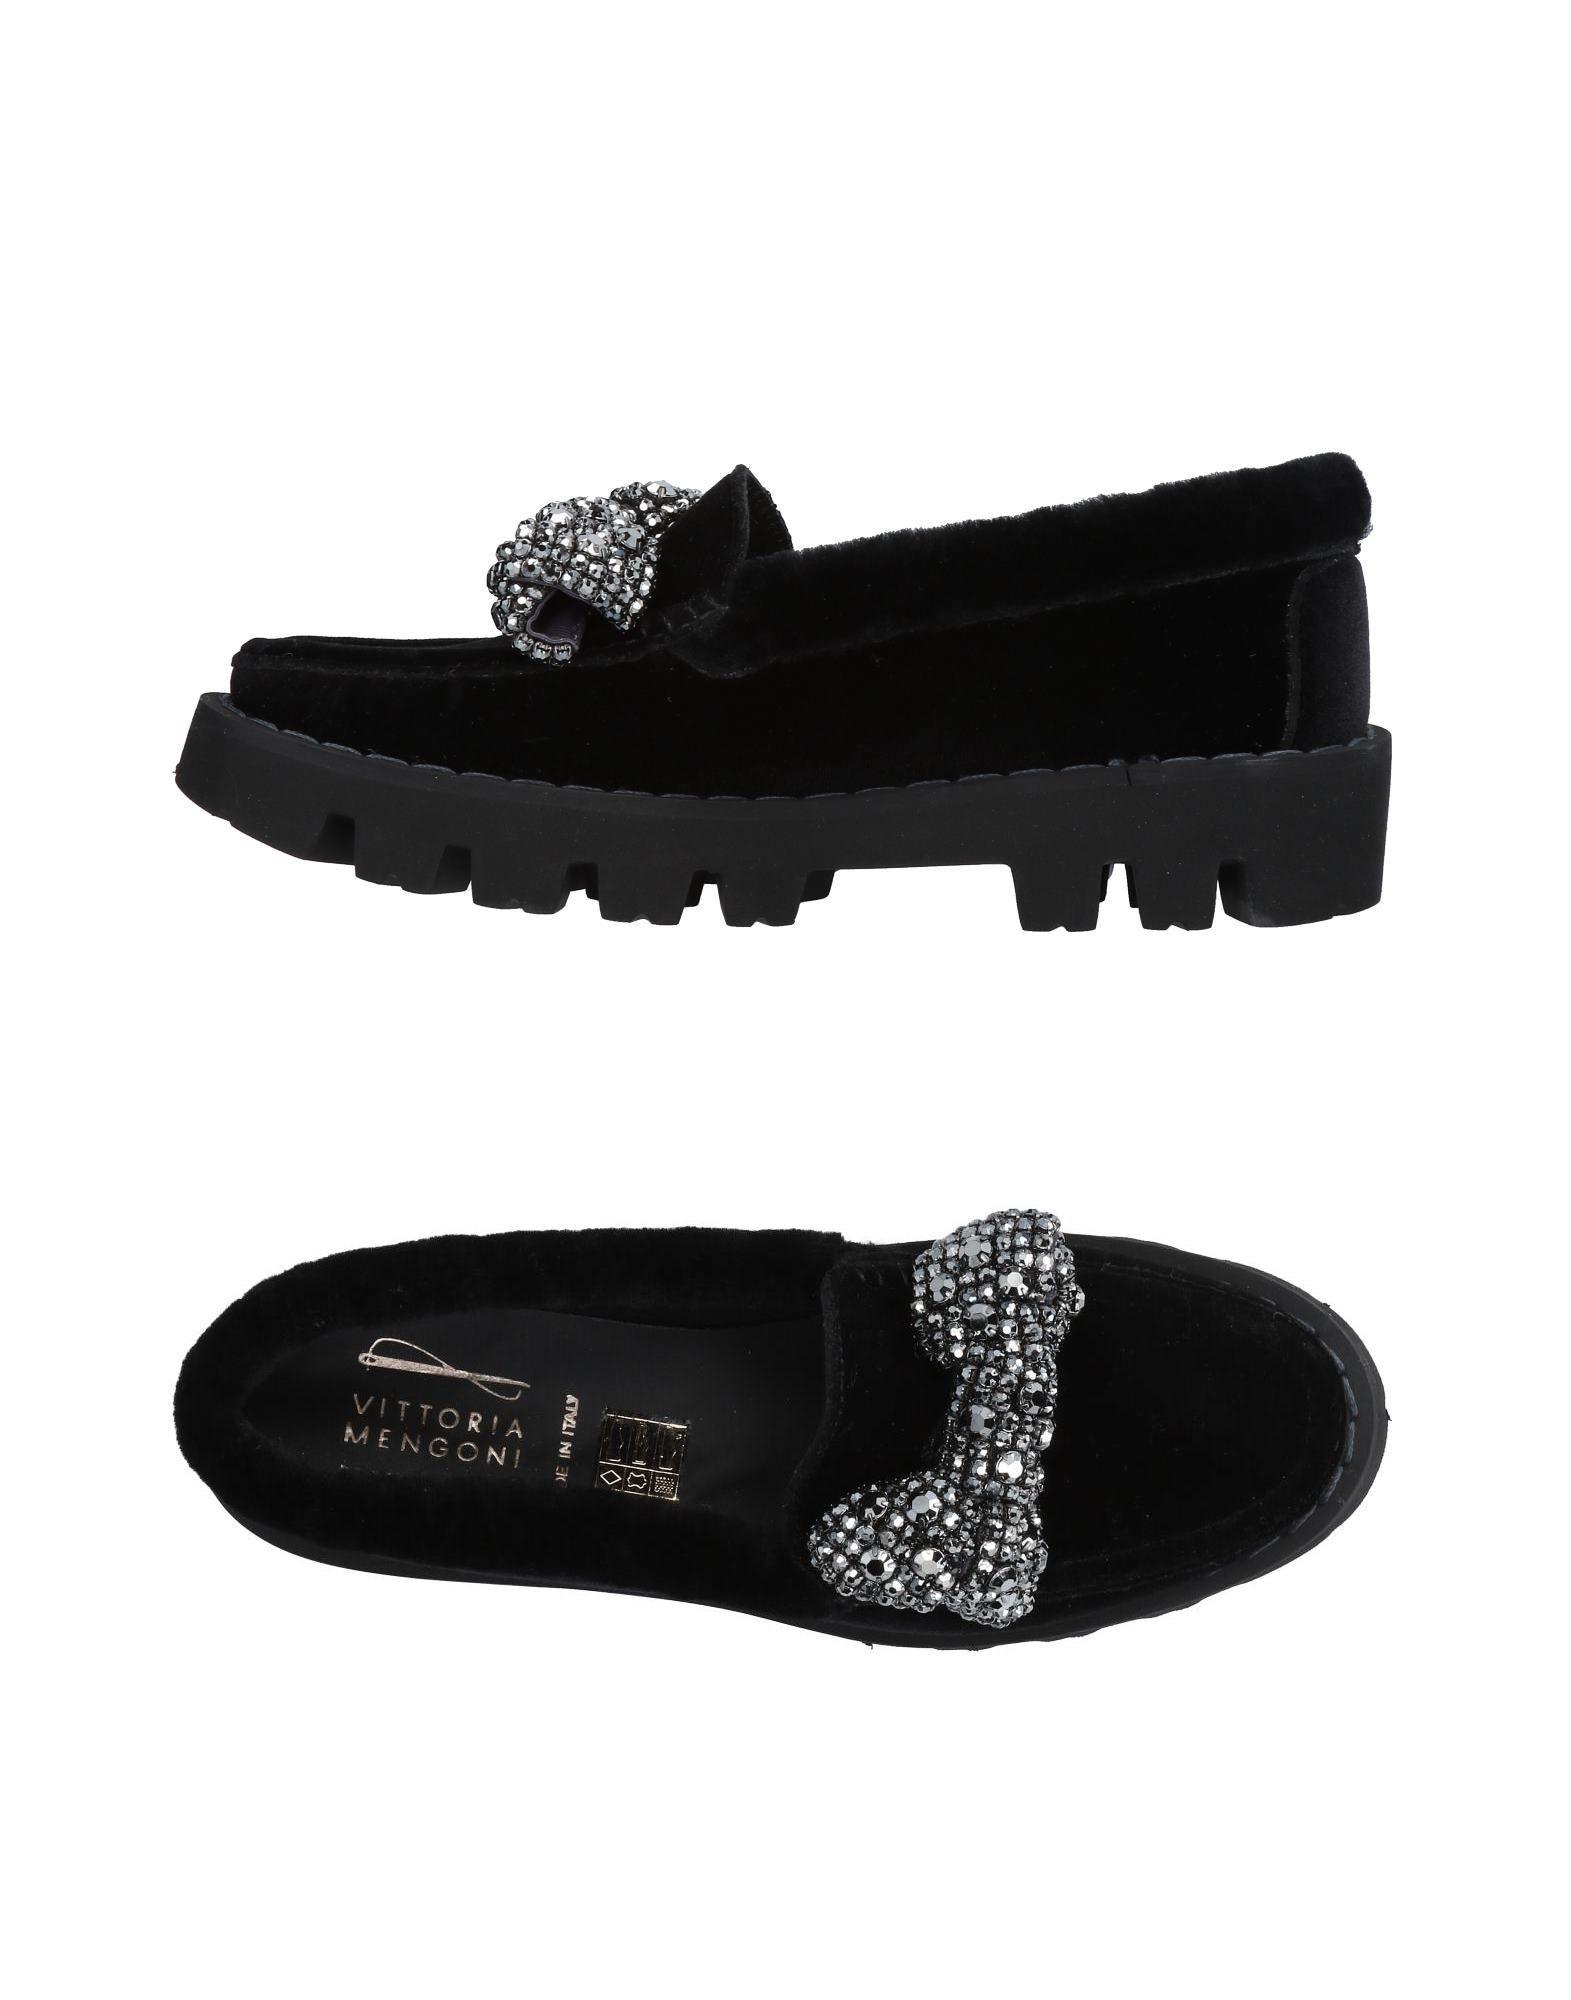 Gut um billige Venezia Schuhe zu tragenVittoria Mengoni Venezia billige Mokassins Damen  11483799BM 221e8d